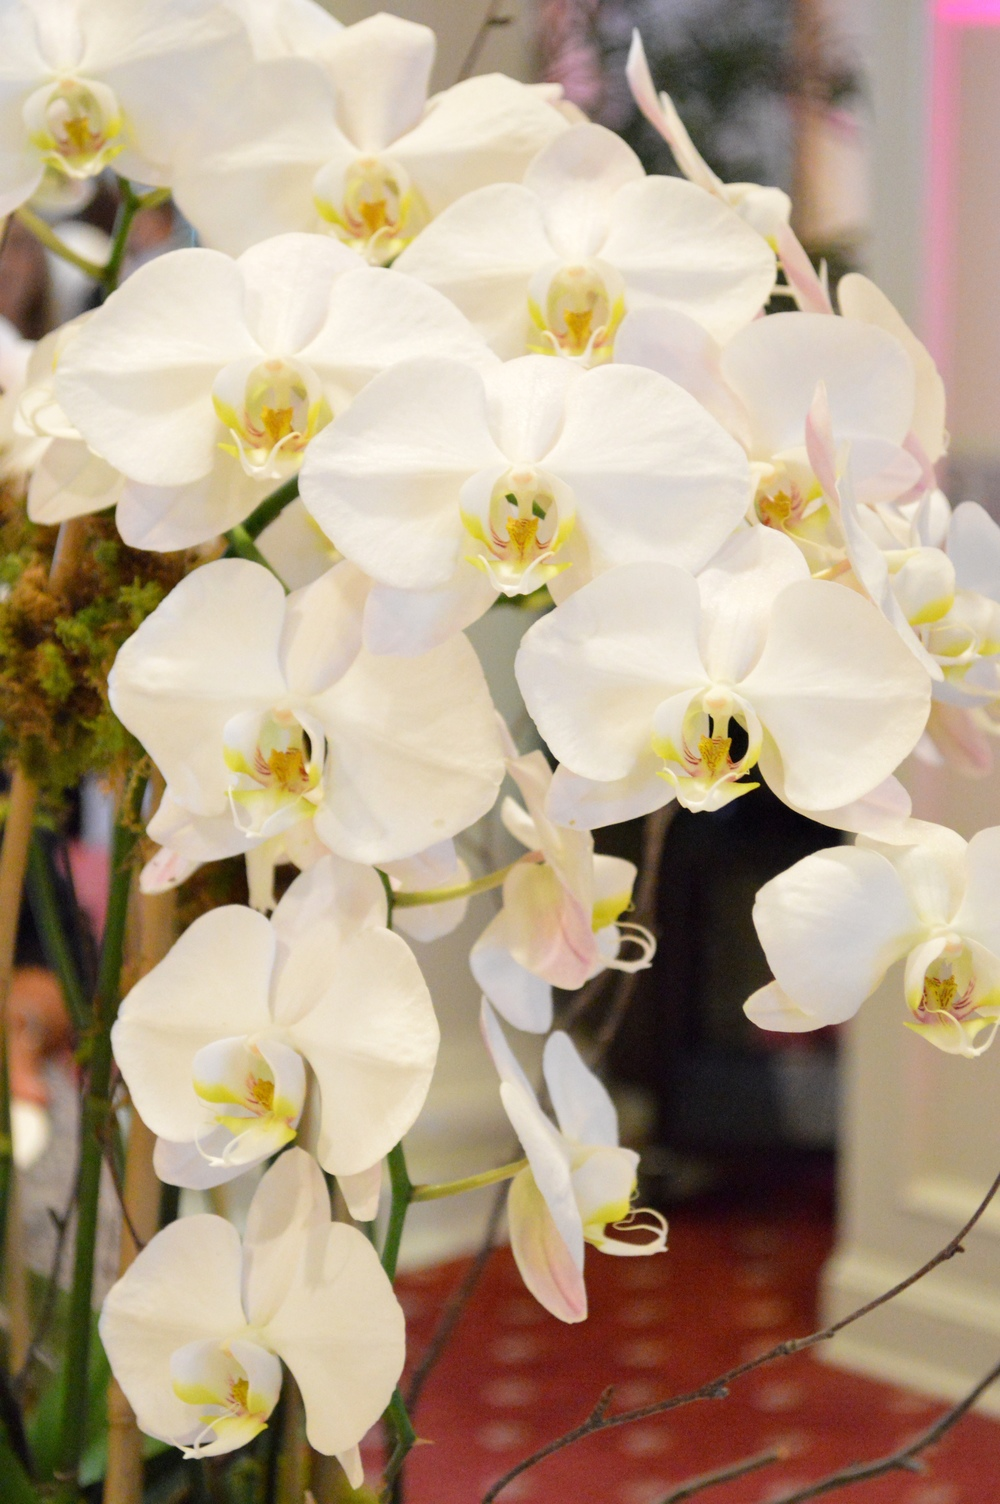 LaurenSchwaiger-Blog-Ballantyne-Hotel-Orchid.jpg